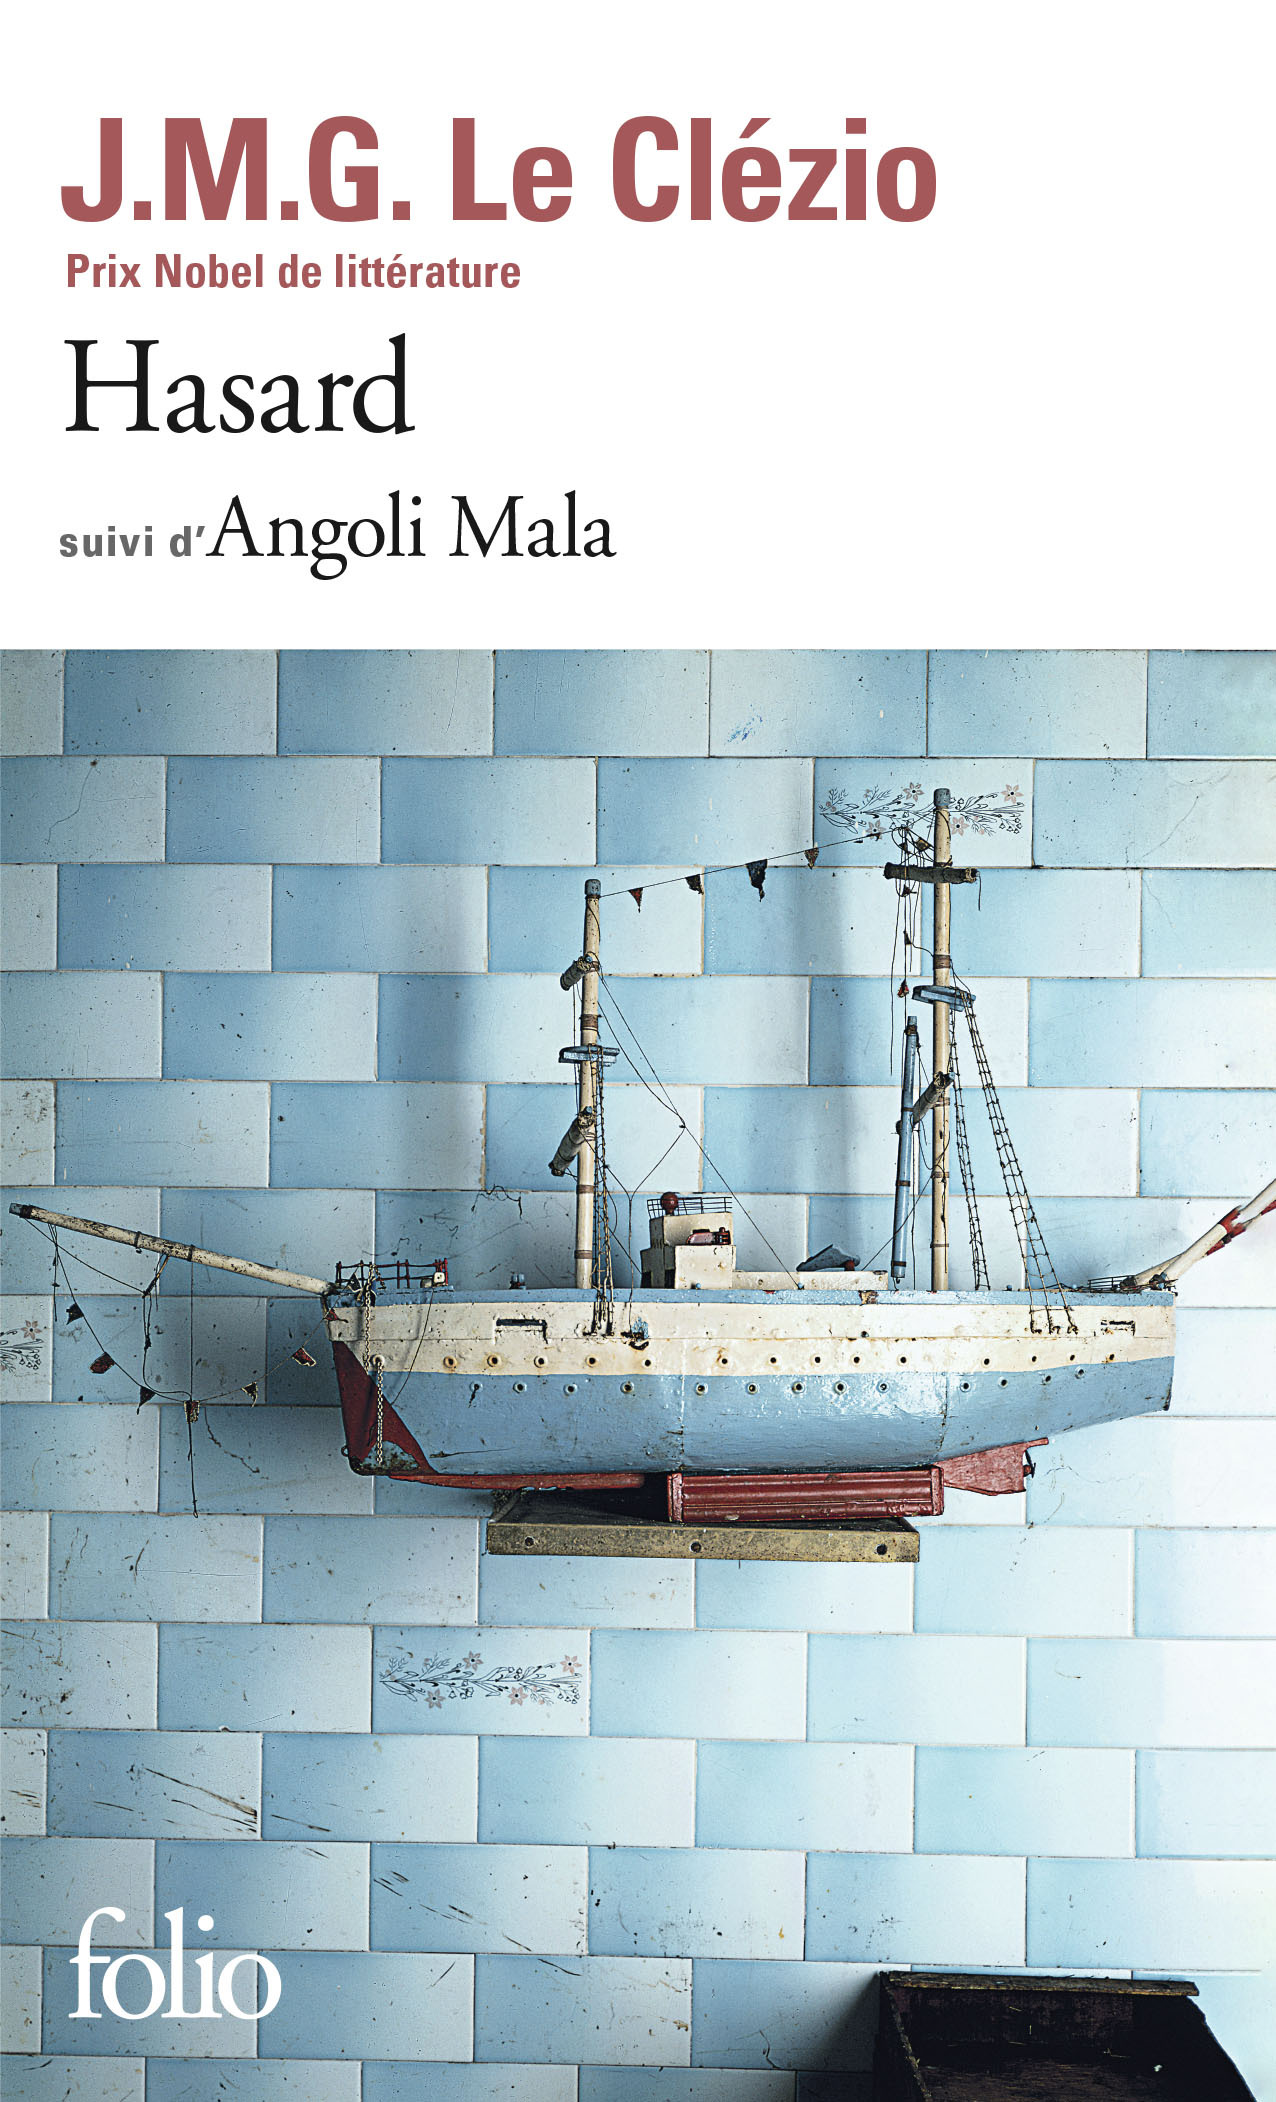 HASARD/ANGOLI MALA